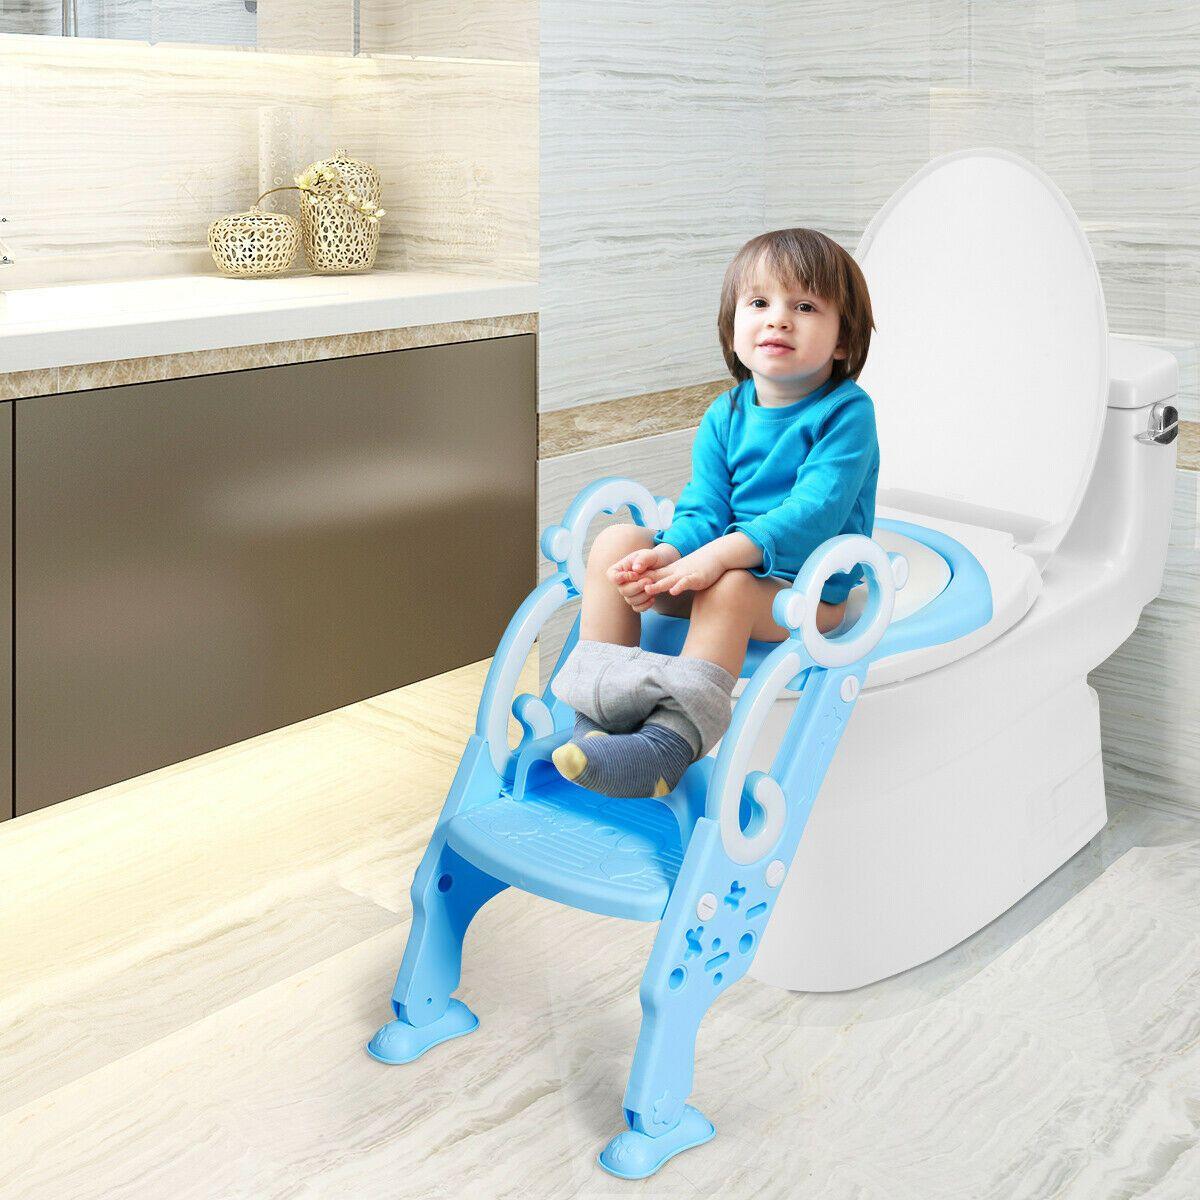 Baby Potty Seat Lovely Egg Children Toilet Chair Training